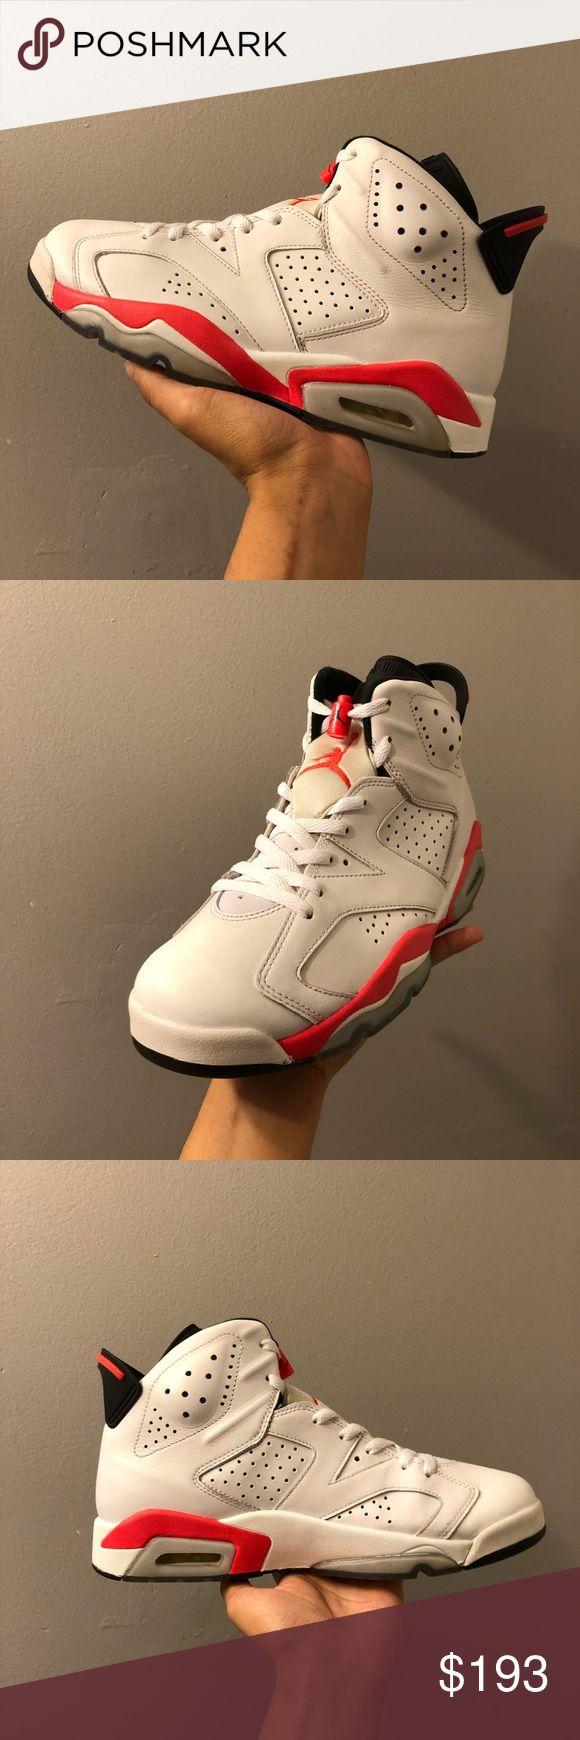 jordan shoes 3d vector grapher online 757948